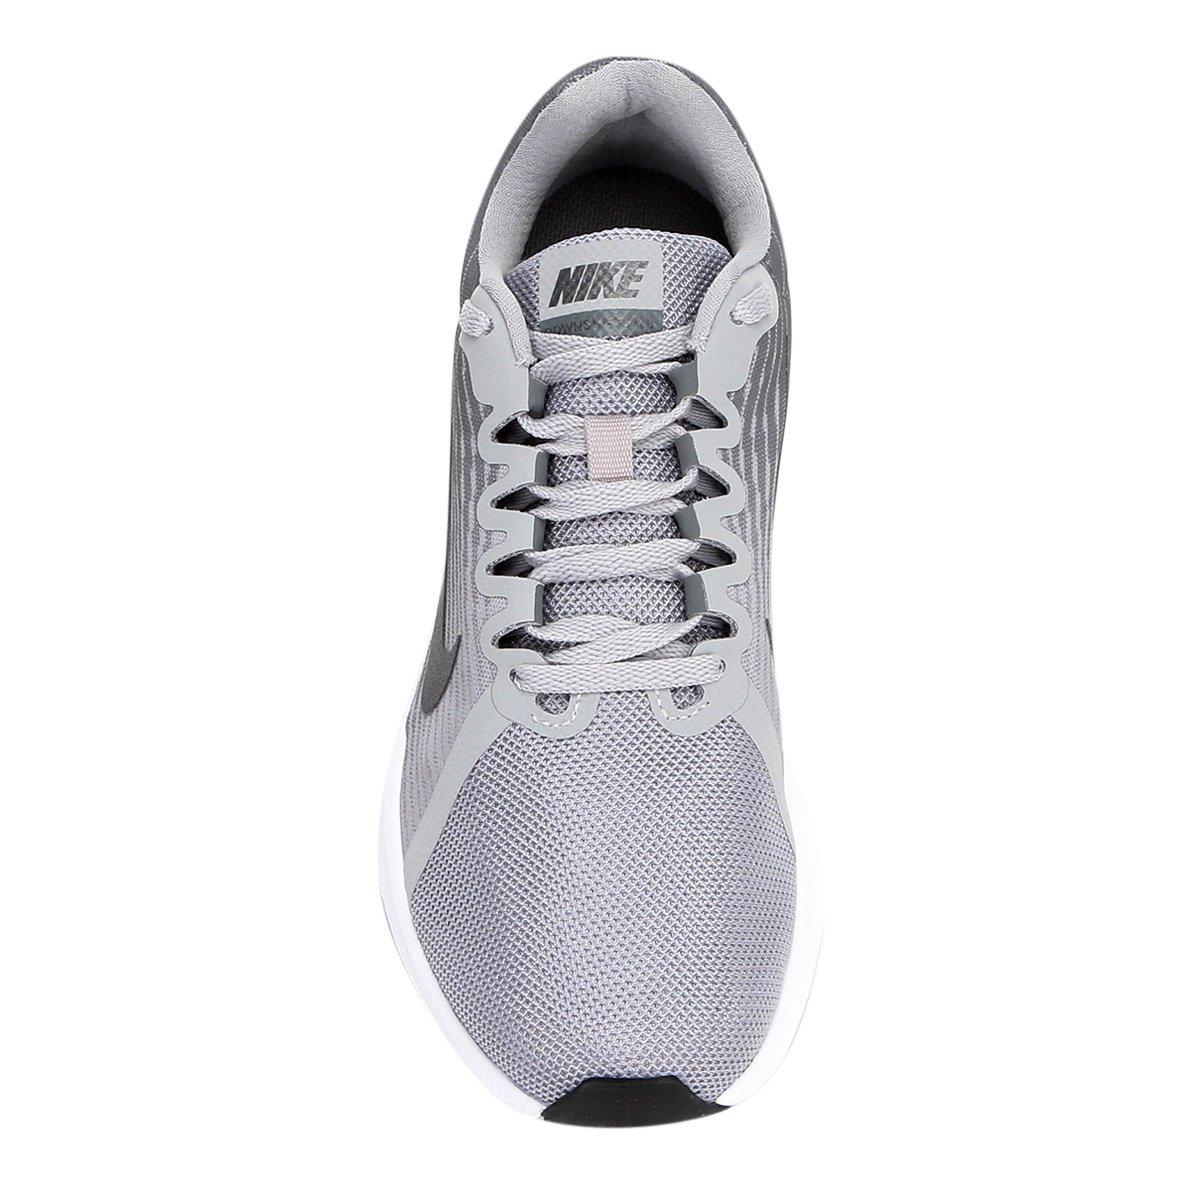 Tênis Nike Wmns Downshifter 8 Feminino Tam 39 Shopping